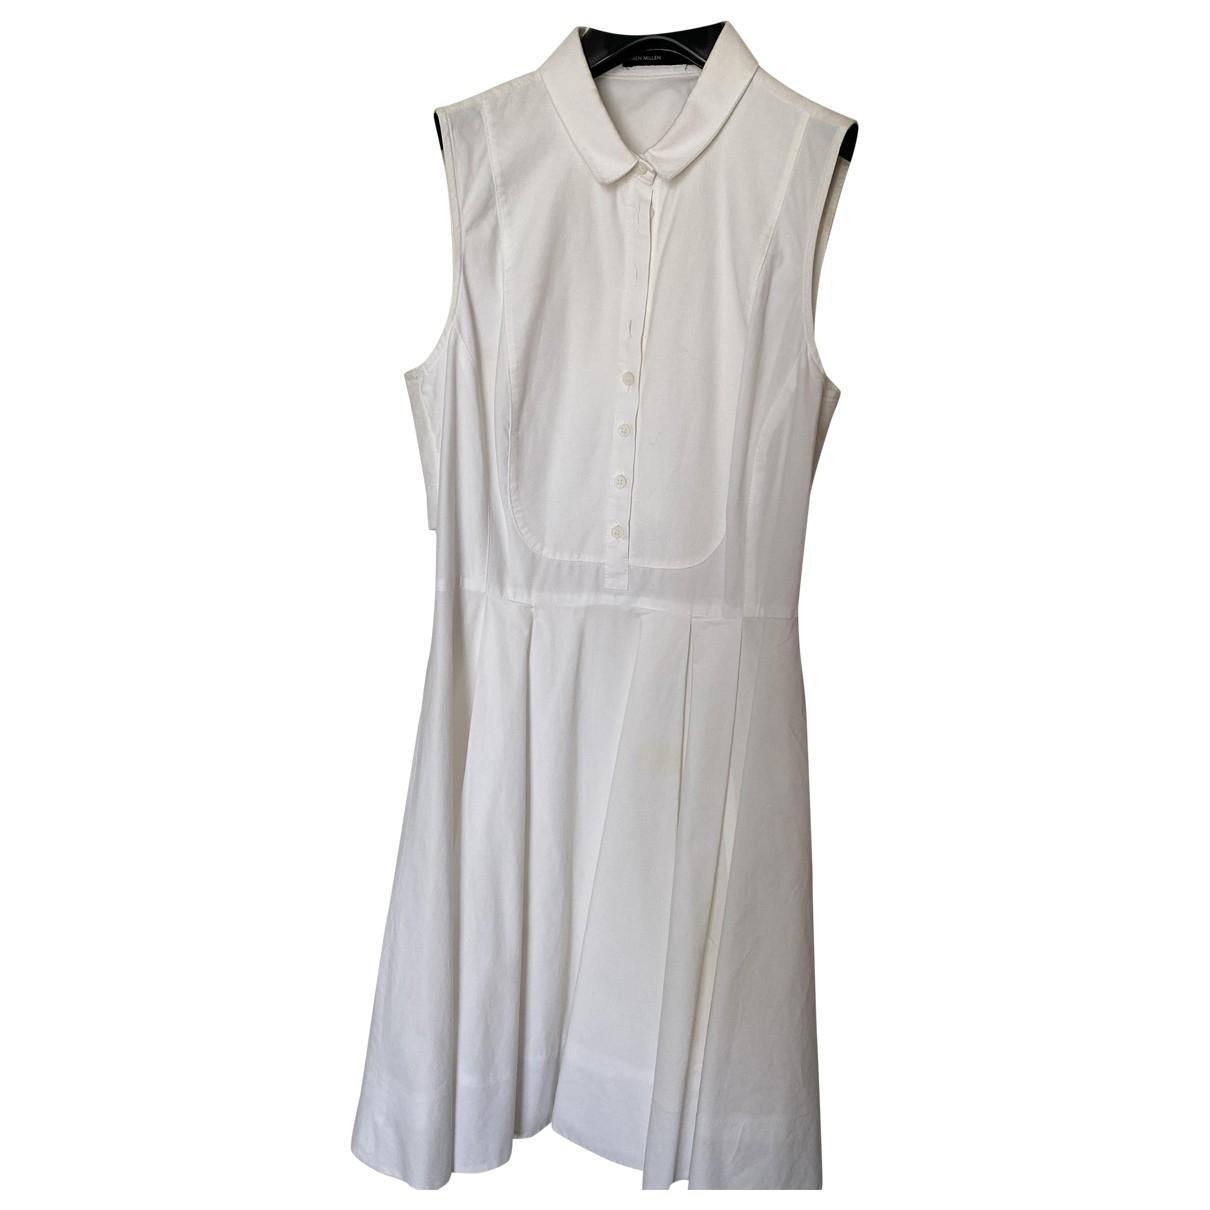 Karen Millen - Robe   pour femme en coton - blanc